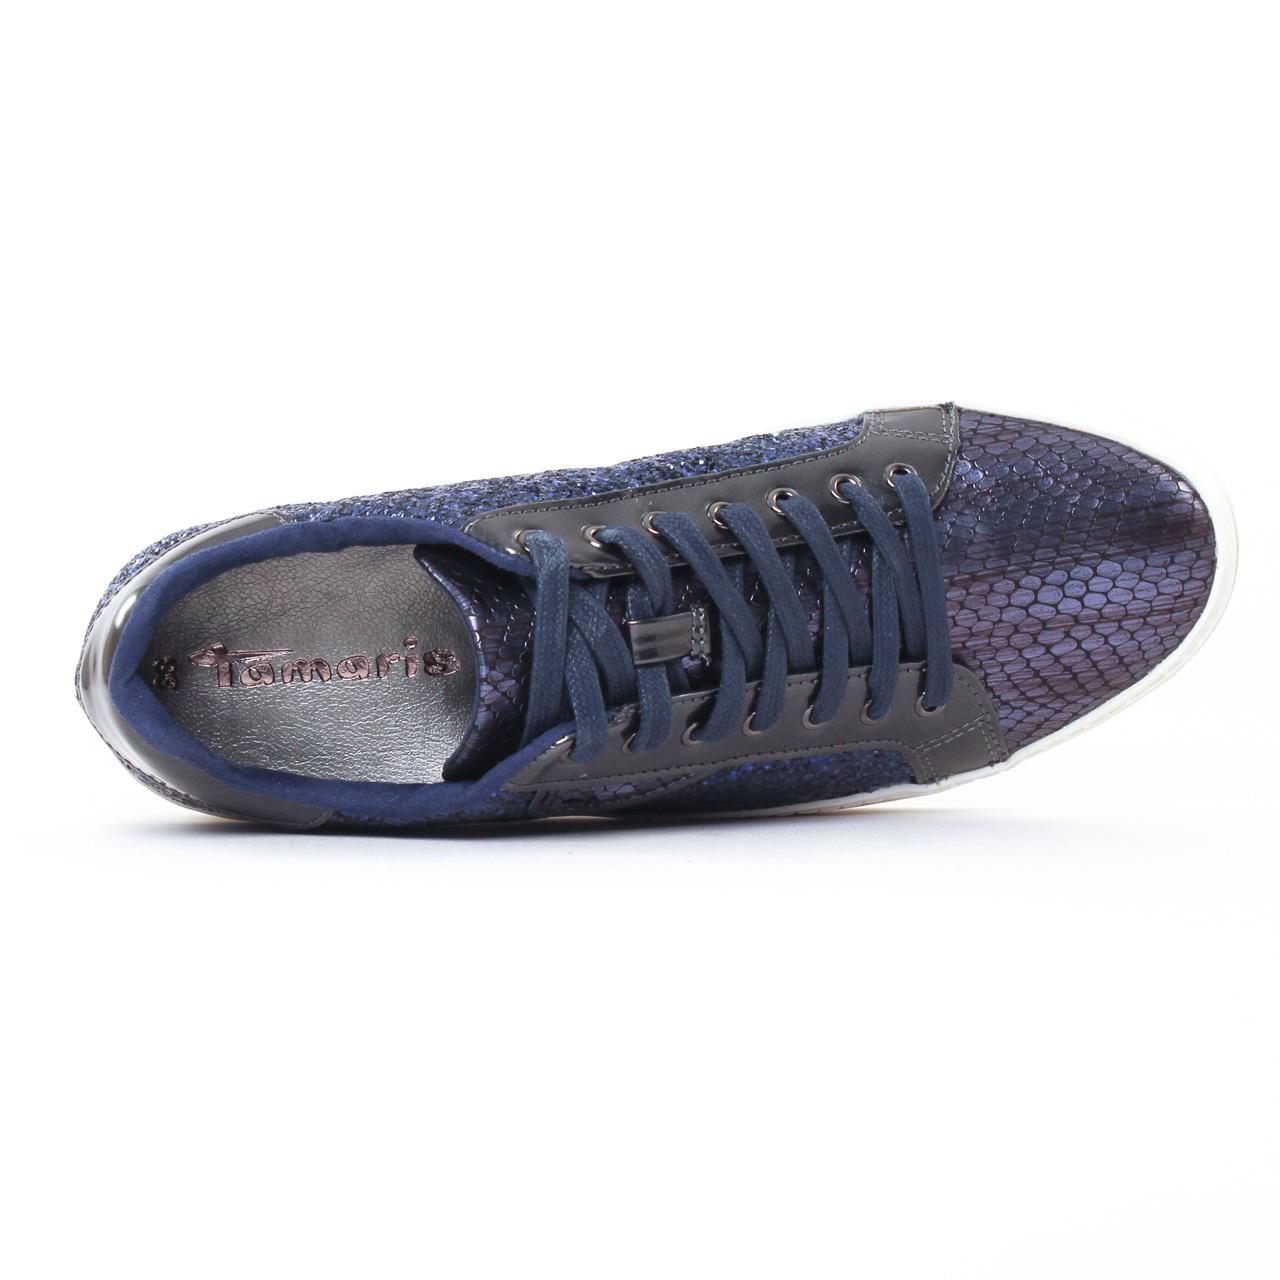 Baskets Tamaris bleu marine